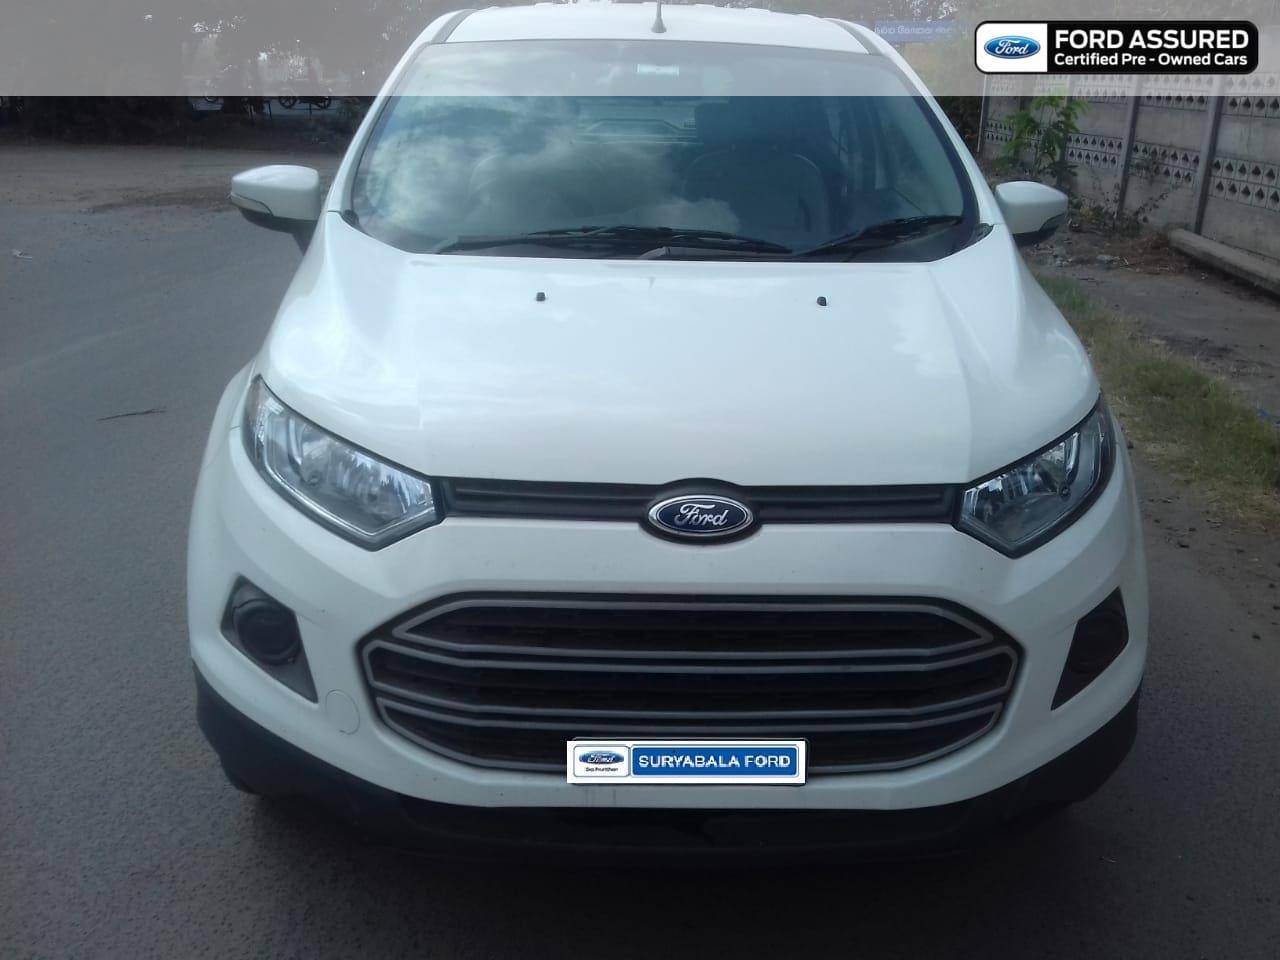 Ford EcoSport 1.5 TDCi Trend BSIV